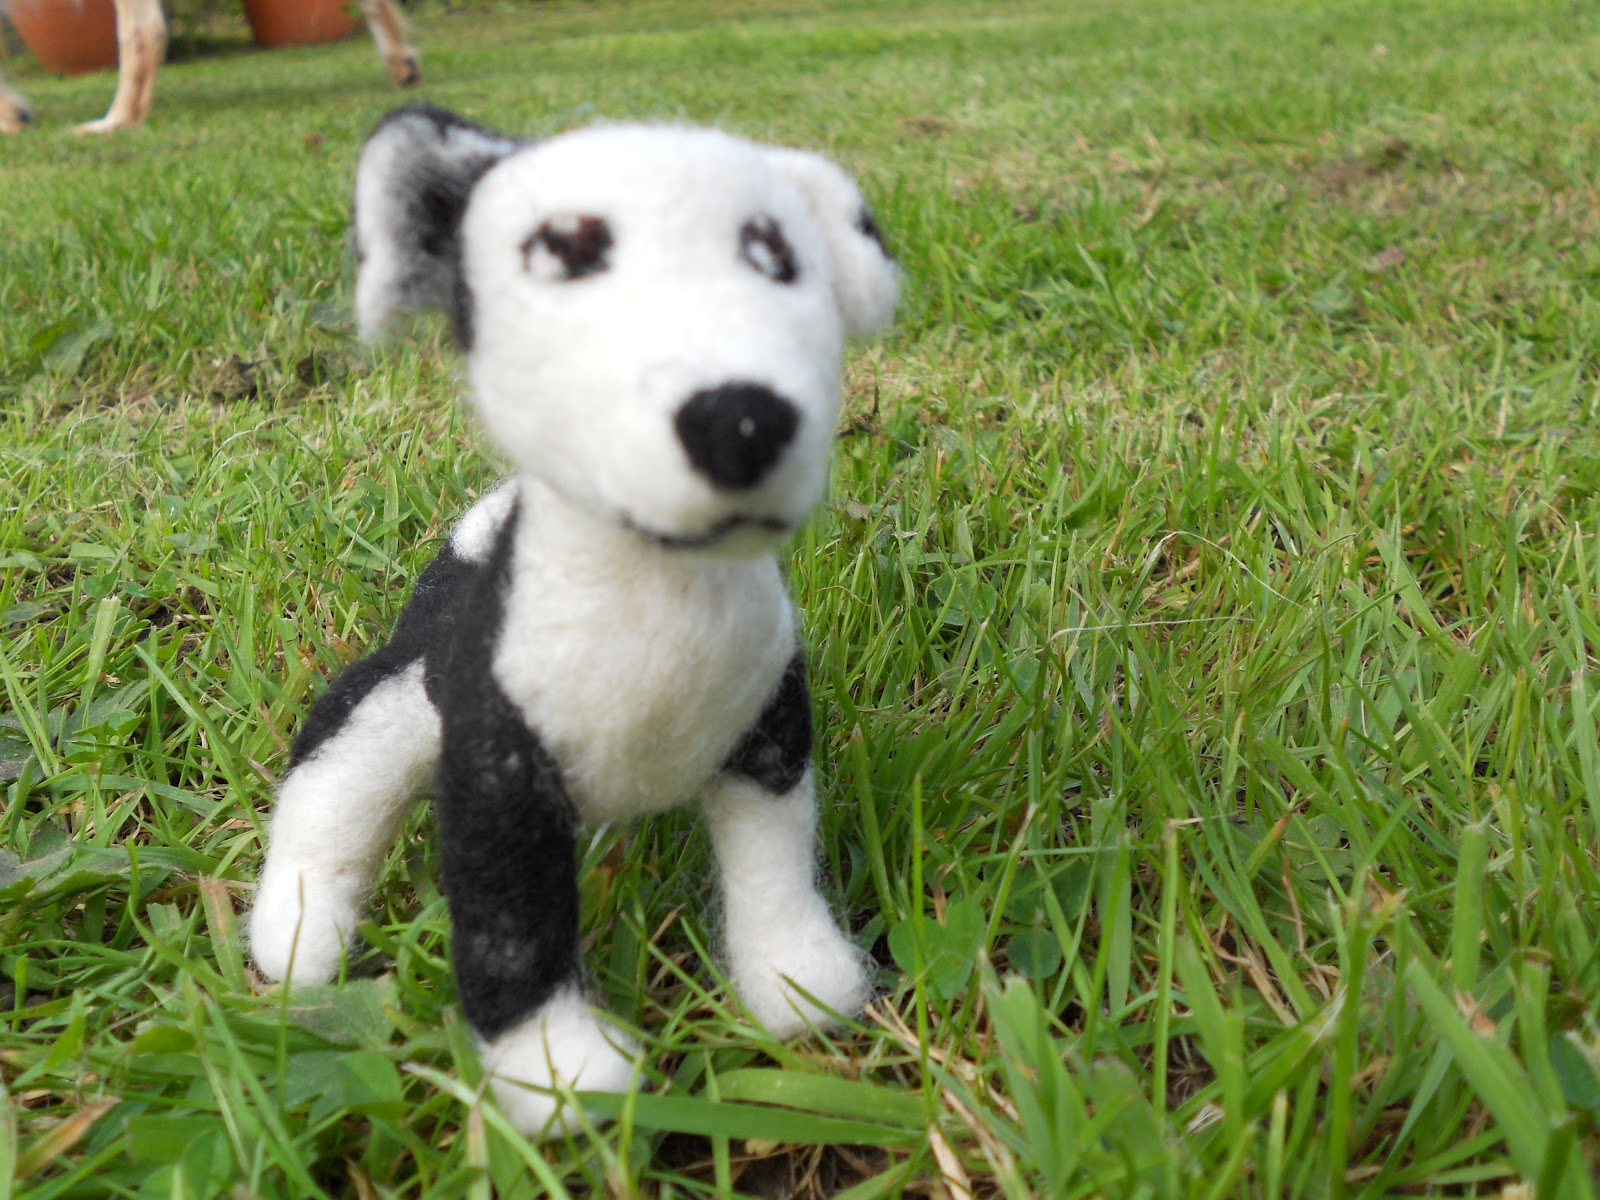 Ben Mcfuzzylugs : A-Z of dog breeds - Border Collie - photo#19